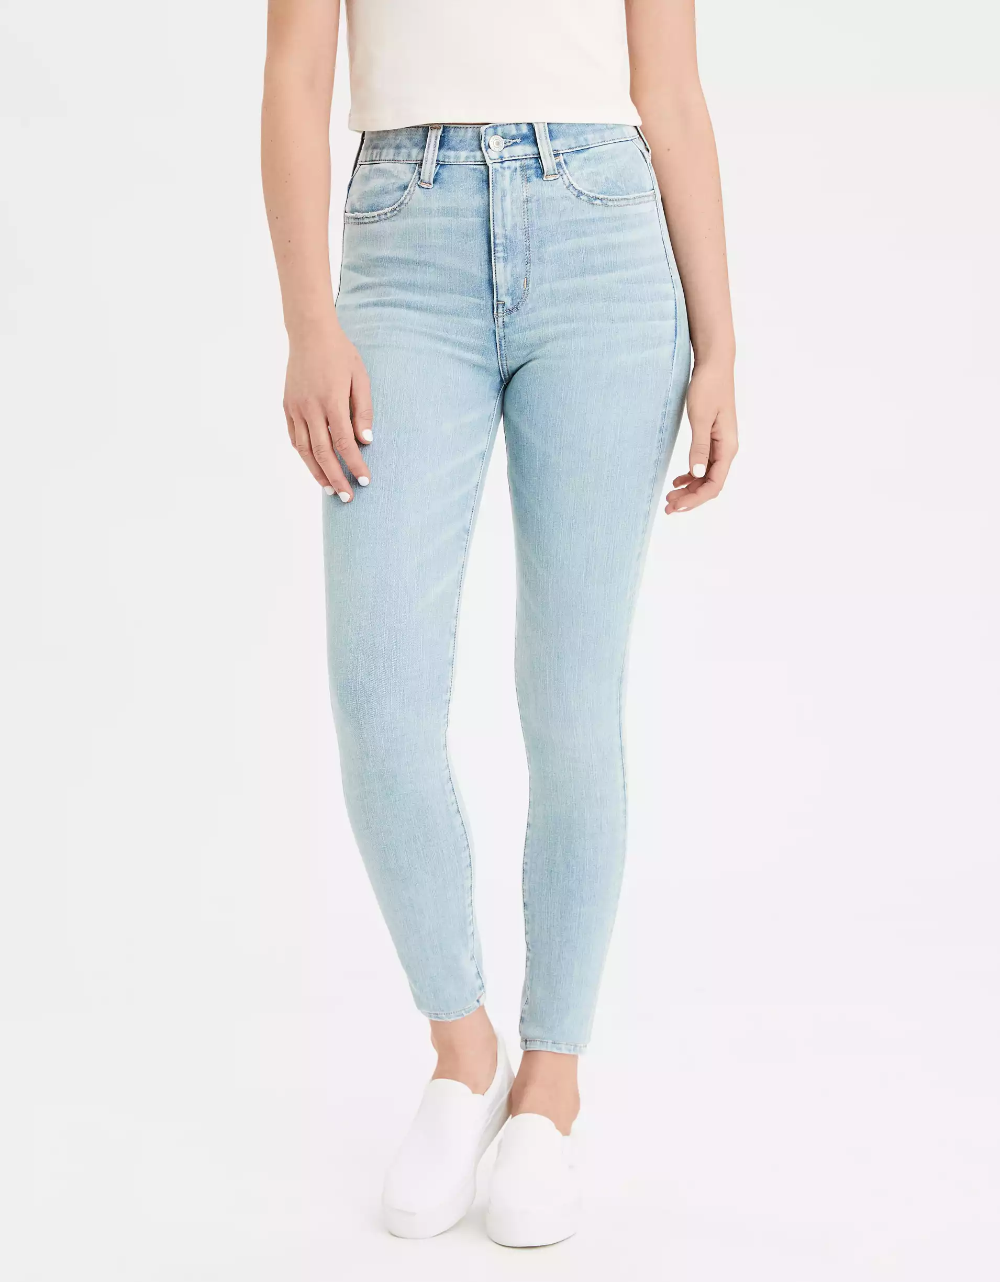 Ae 360 Ne X T Level Highest Waist Jegging With Images High Waist Jeggings High Waist Women Jeans Jeggings